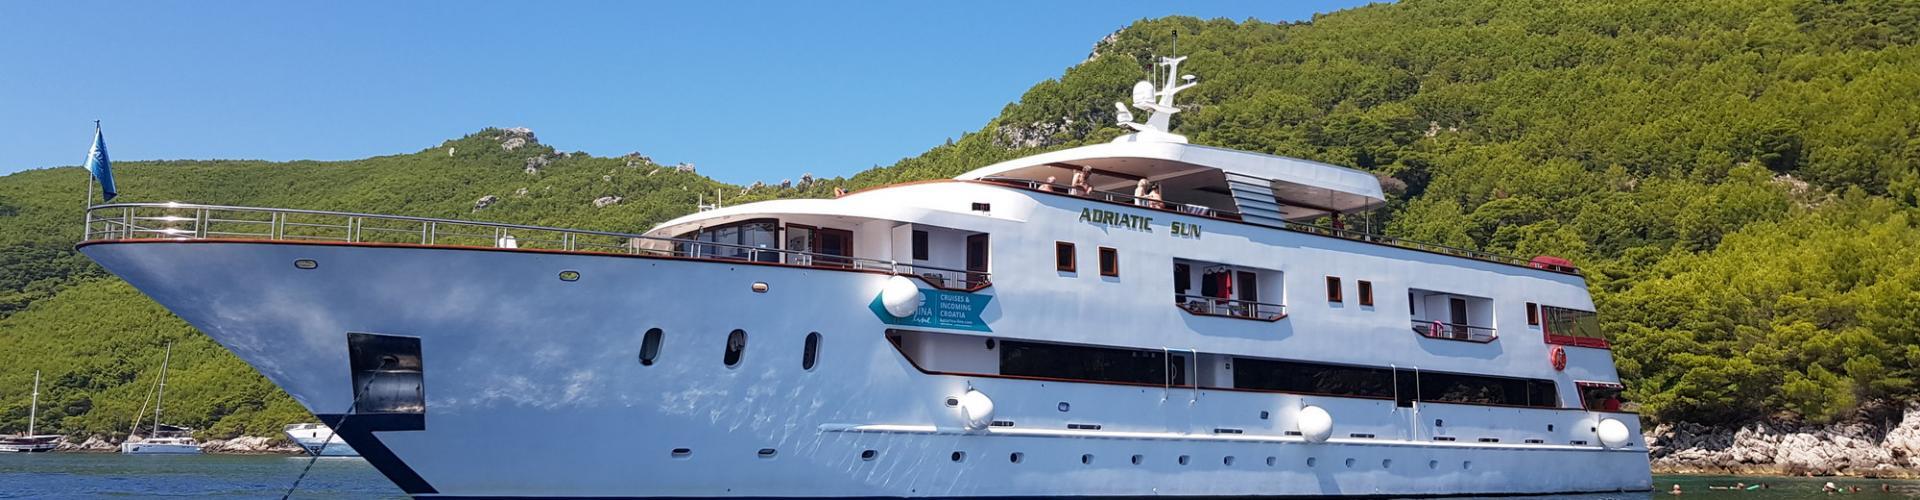 Deluxe Superior cruiser MV Adriatic Sun- motor yacht